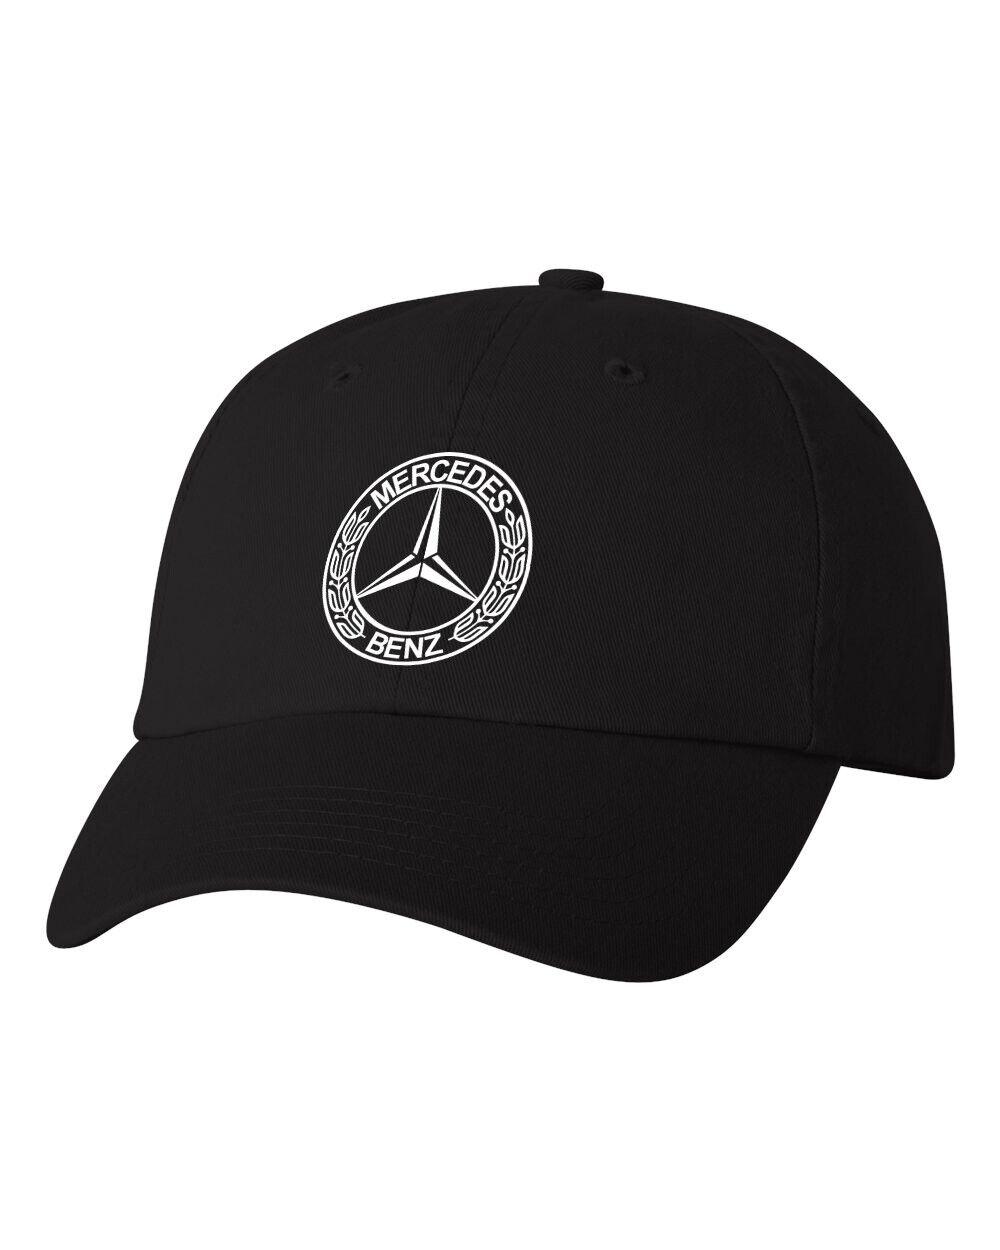 Mercedes Benz Custom Unstructured Dad Hat Adjustable Cap Choose Color New - $9.99